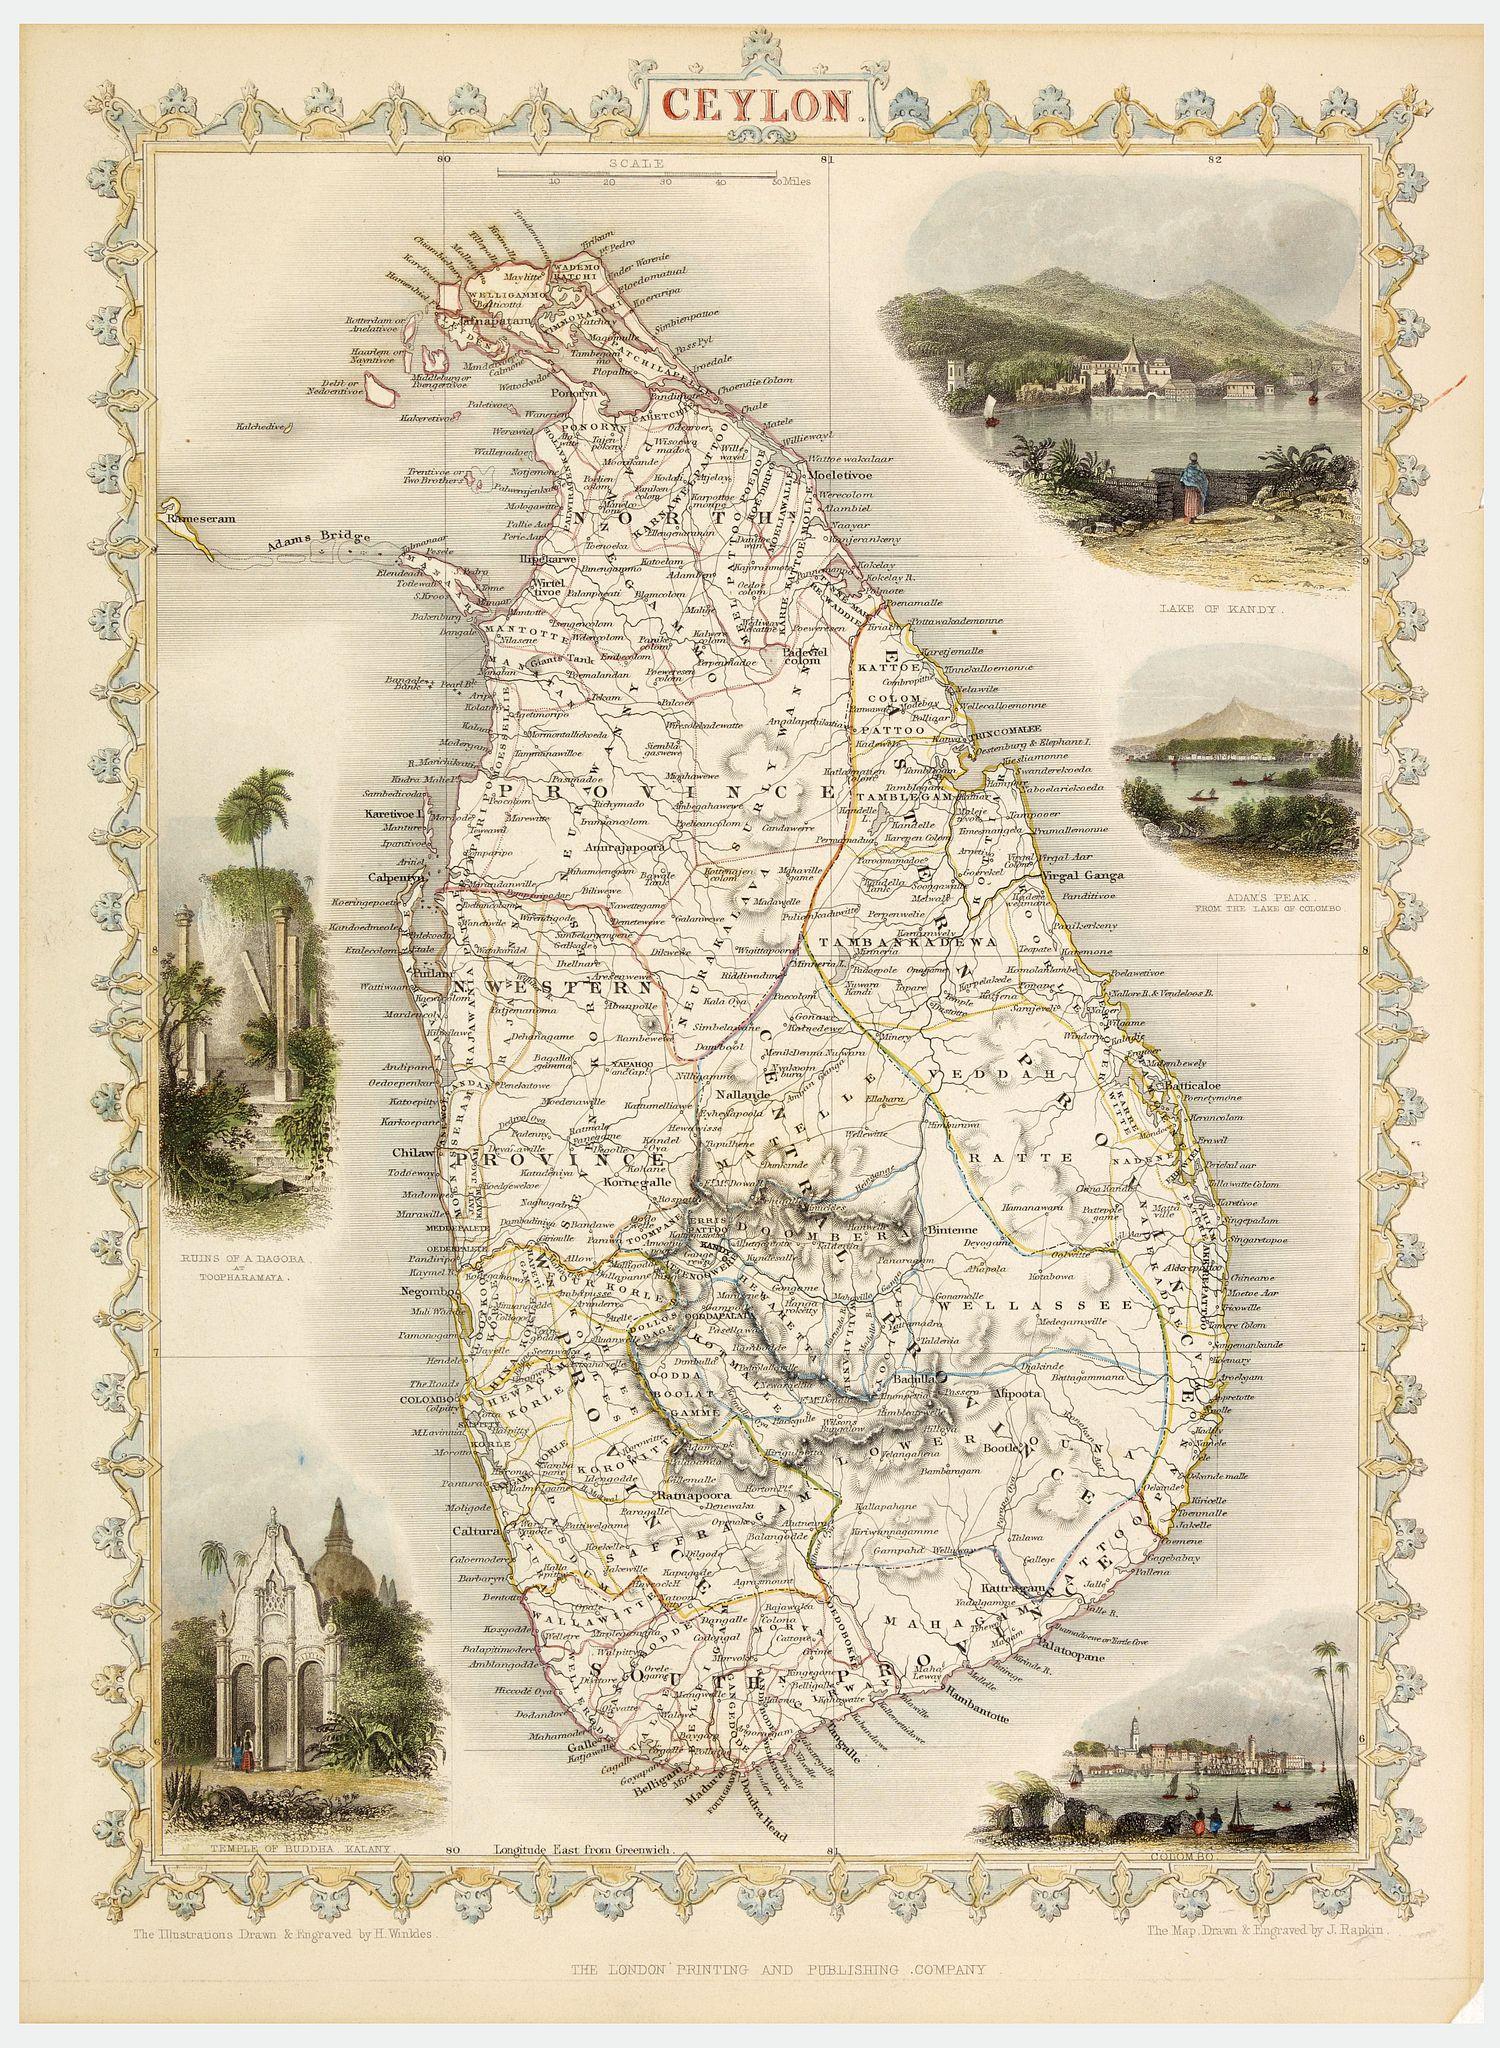 RAPKIN, J. / THE LONDON PRINTING AND PUBLISHING CO -  Ceylon.